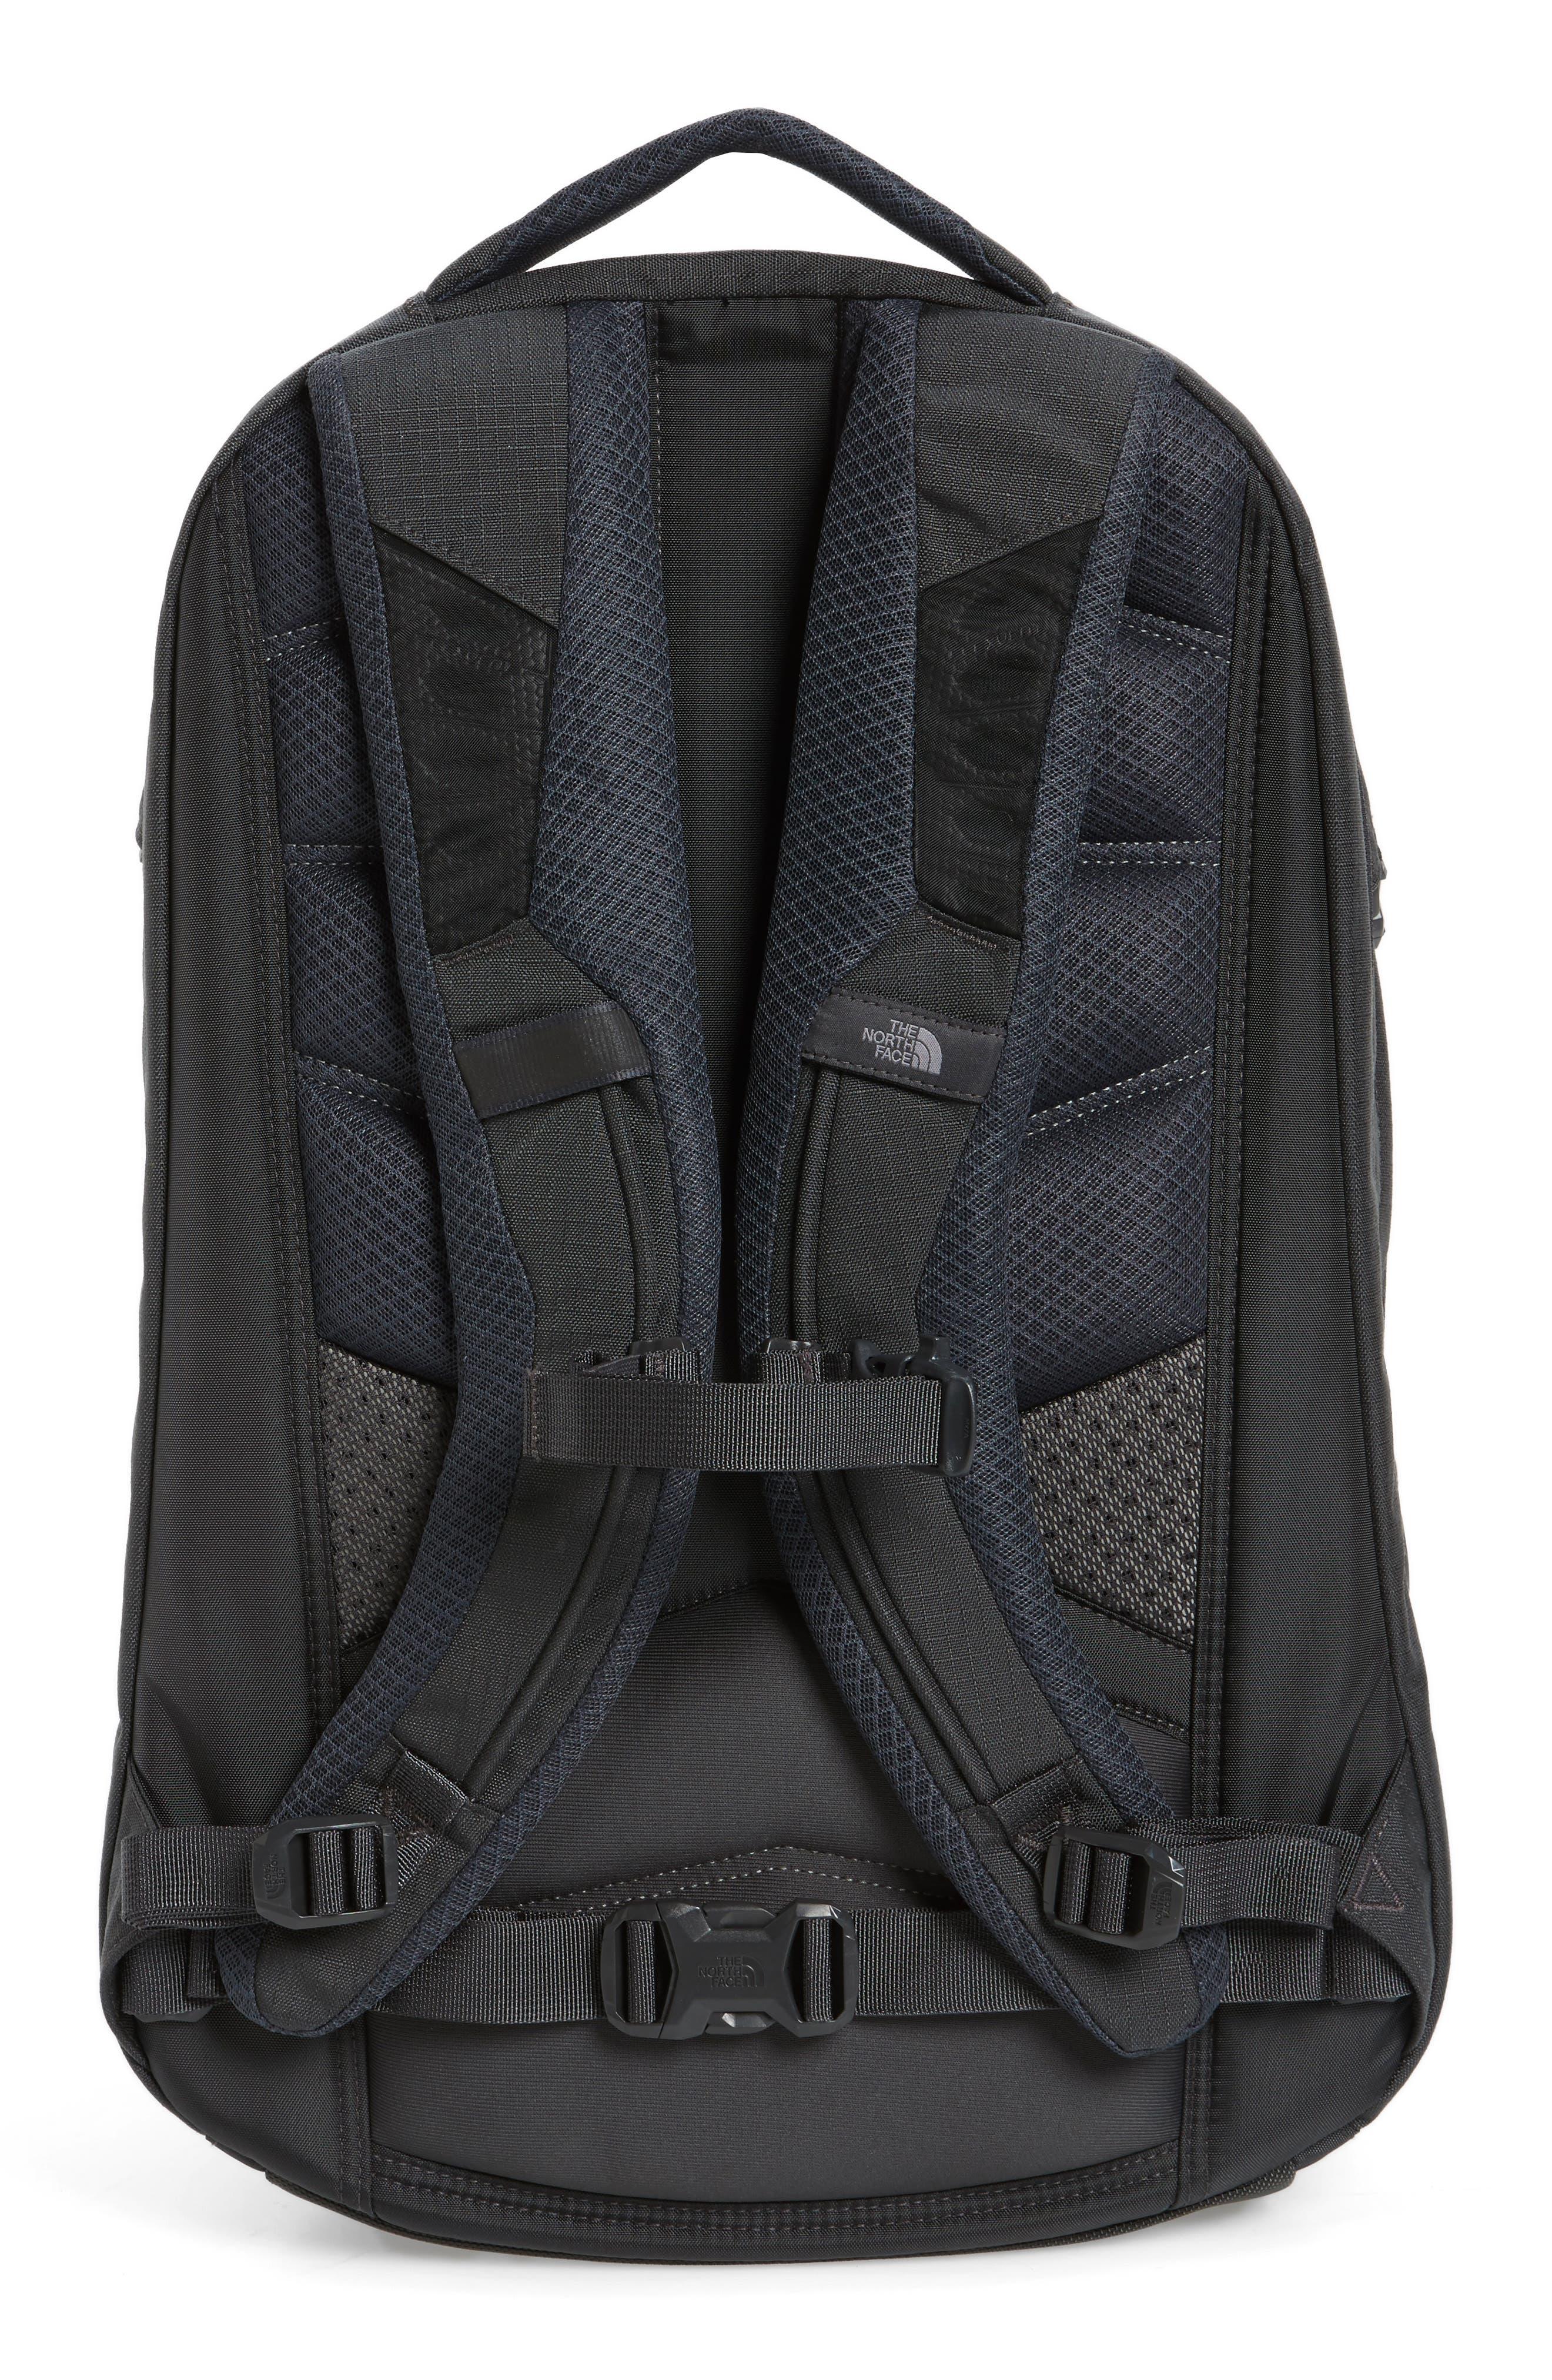 Surge 33L Backpack,                             Alternate thumbnail 10, color,